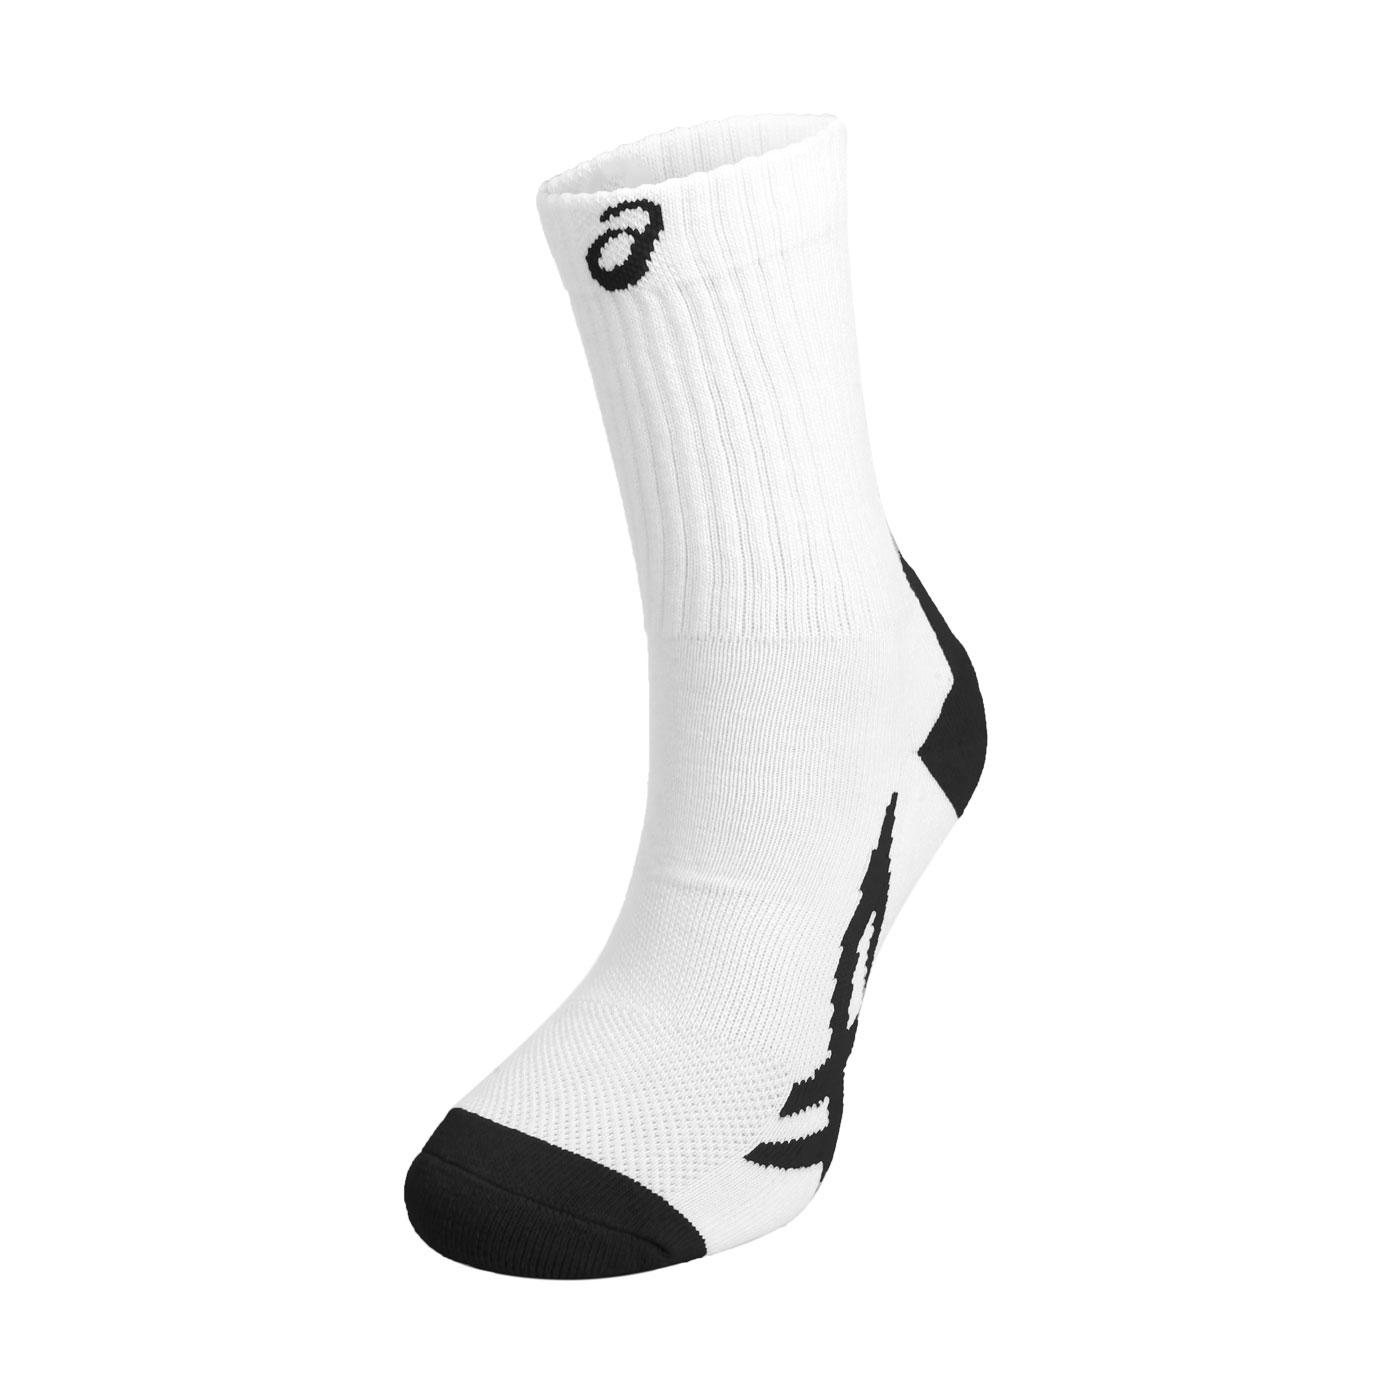 ASICS 運動中筒襪 Z32011-0123 - 白黑